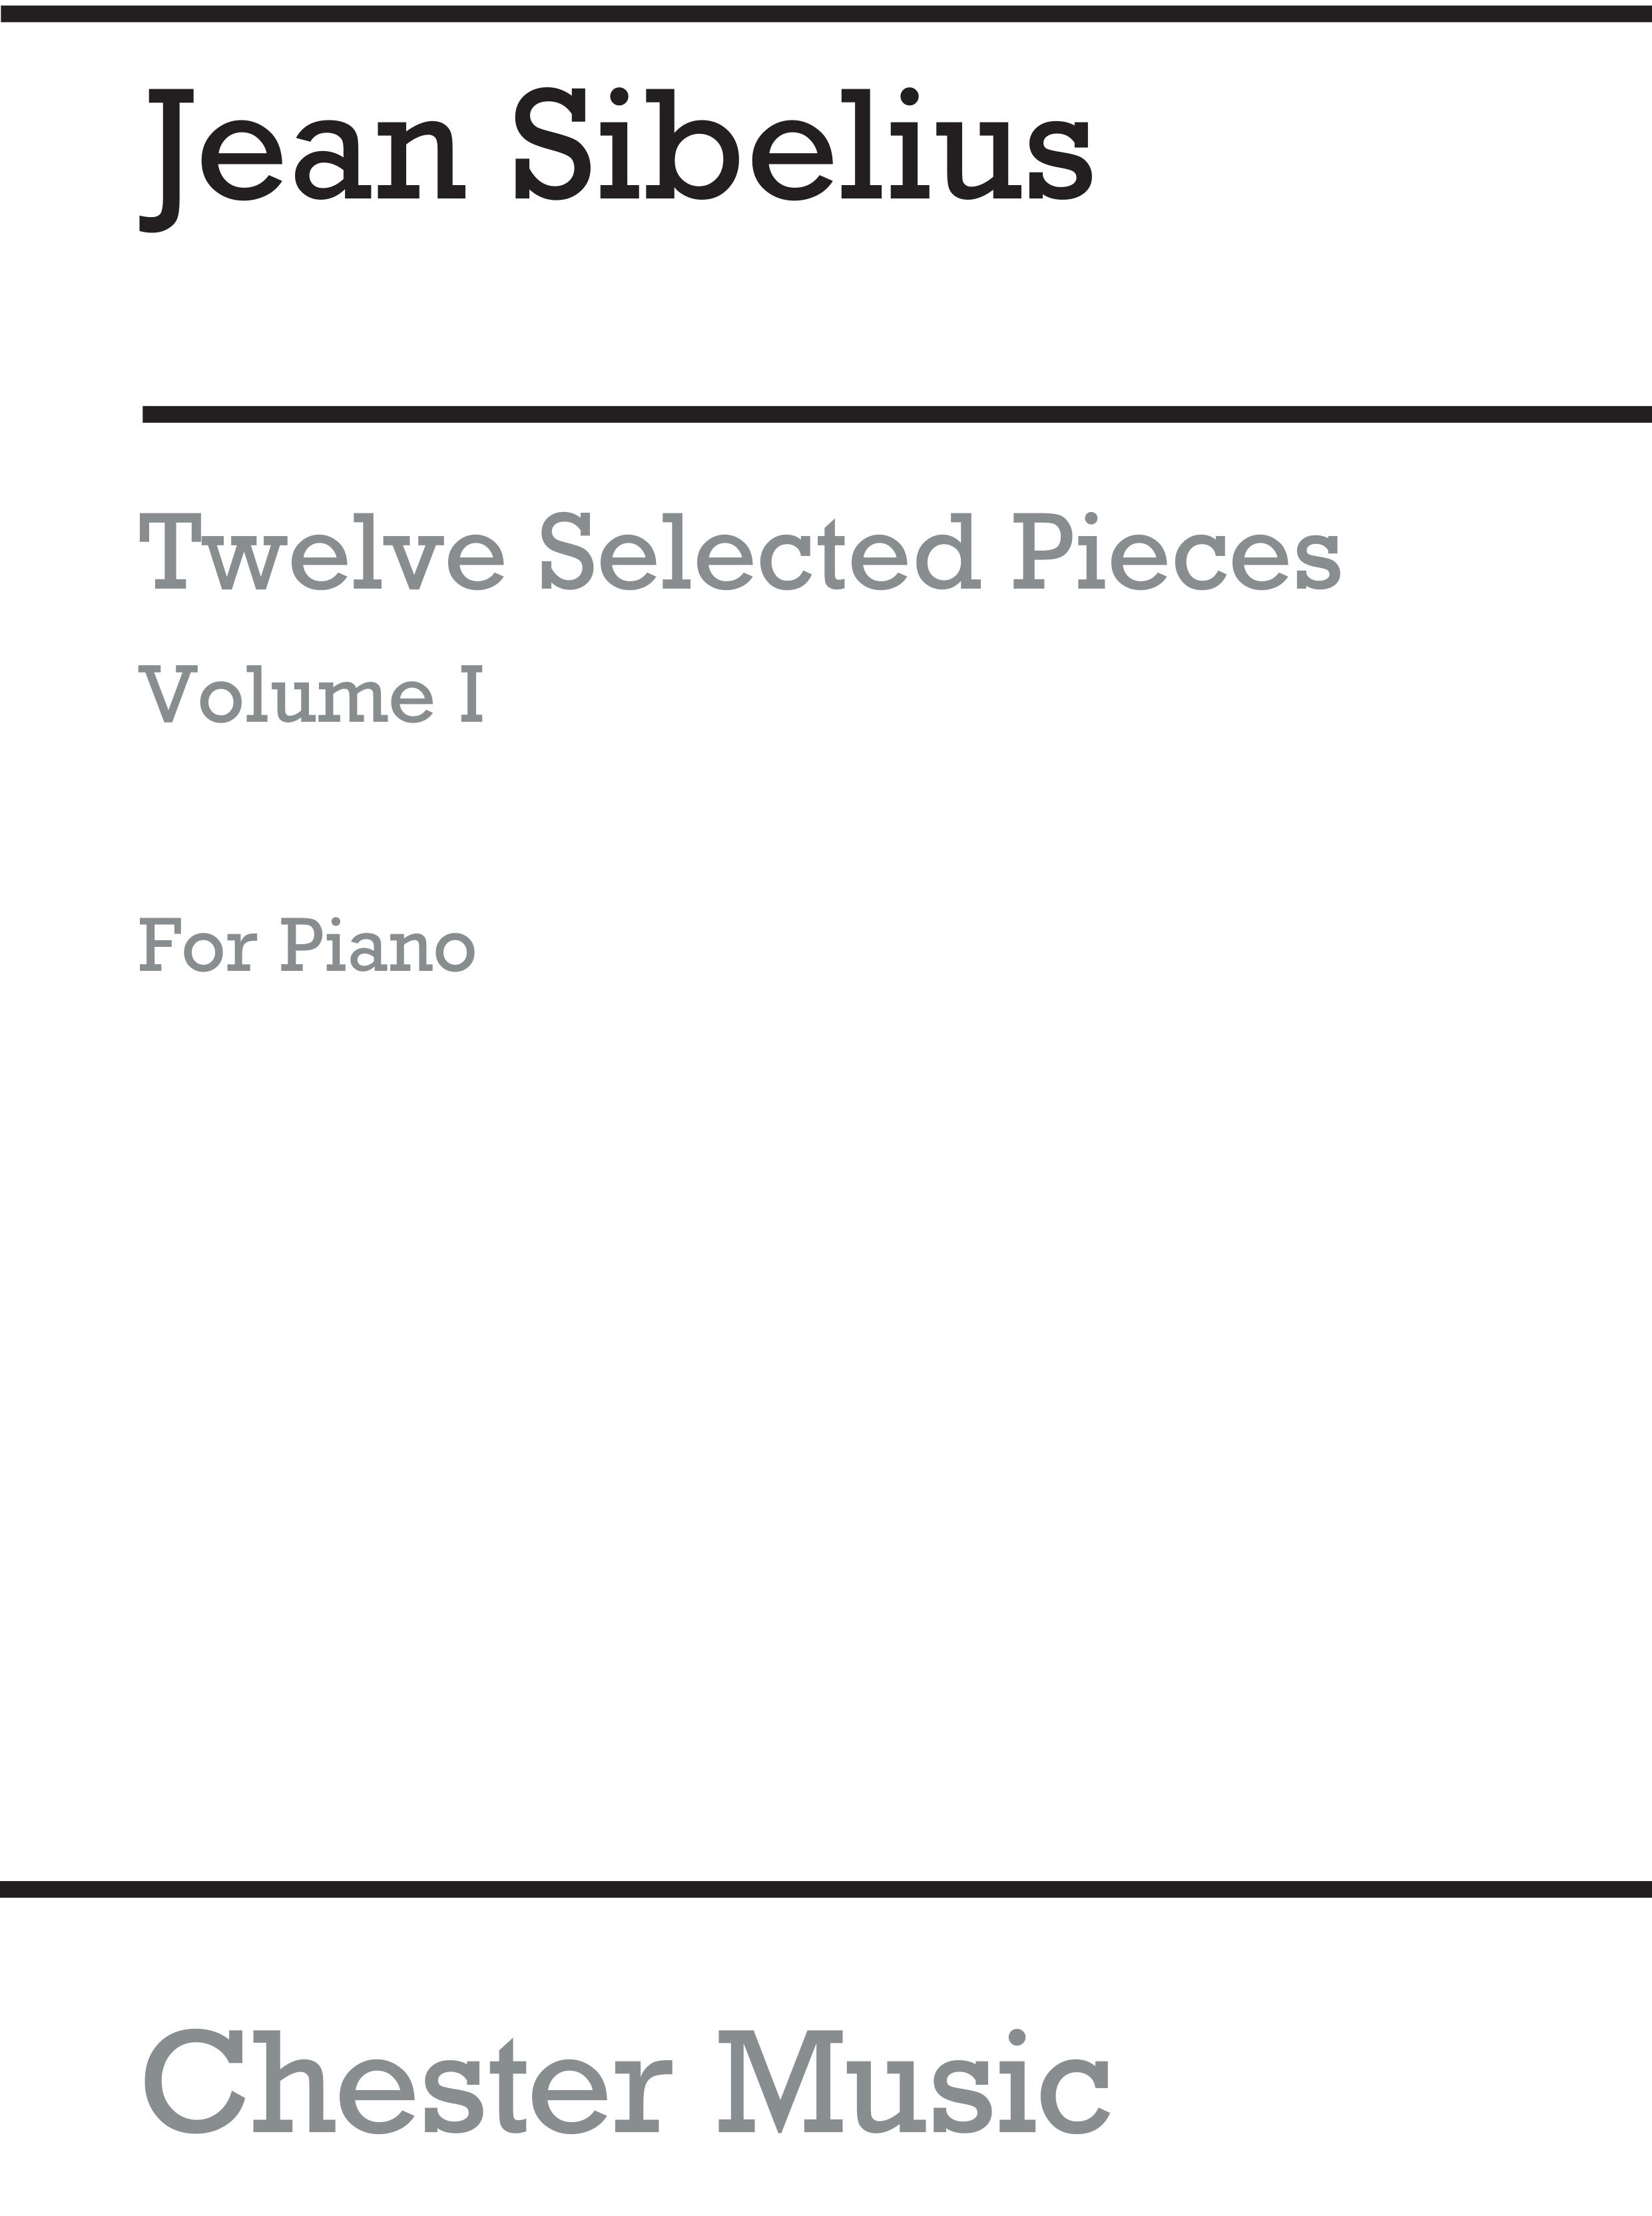 Jean Sibelius: Twelve Selected Pieces For Piano Vol.1: Piano: Instrumental Album